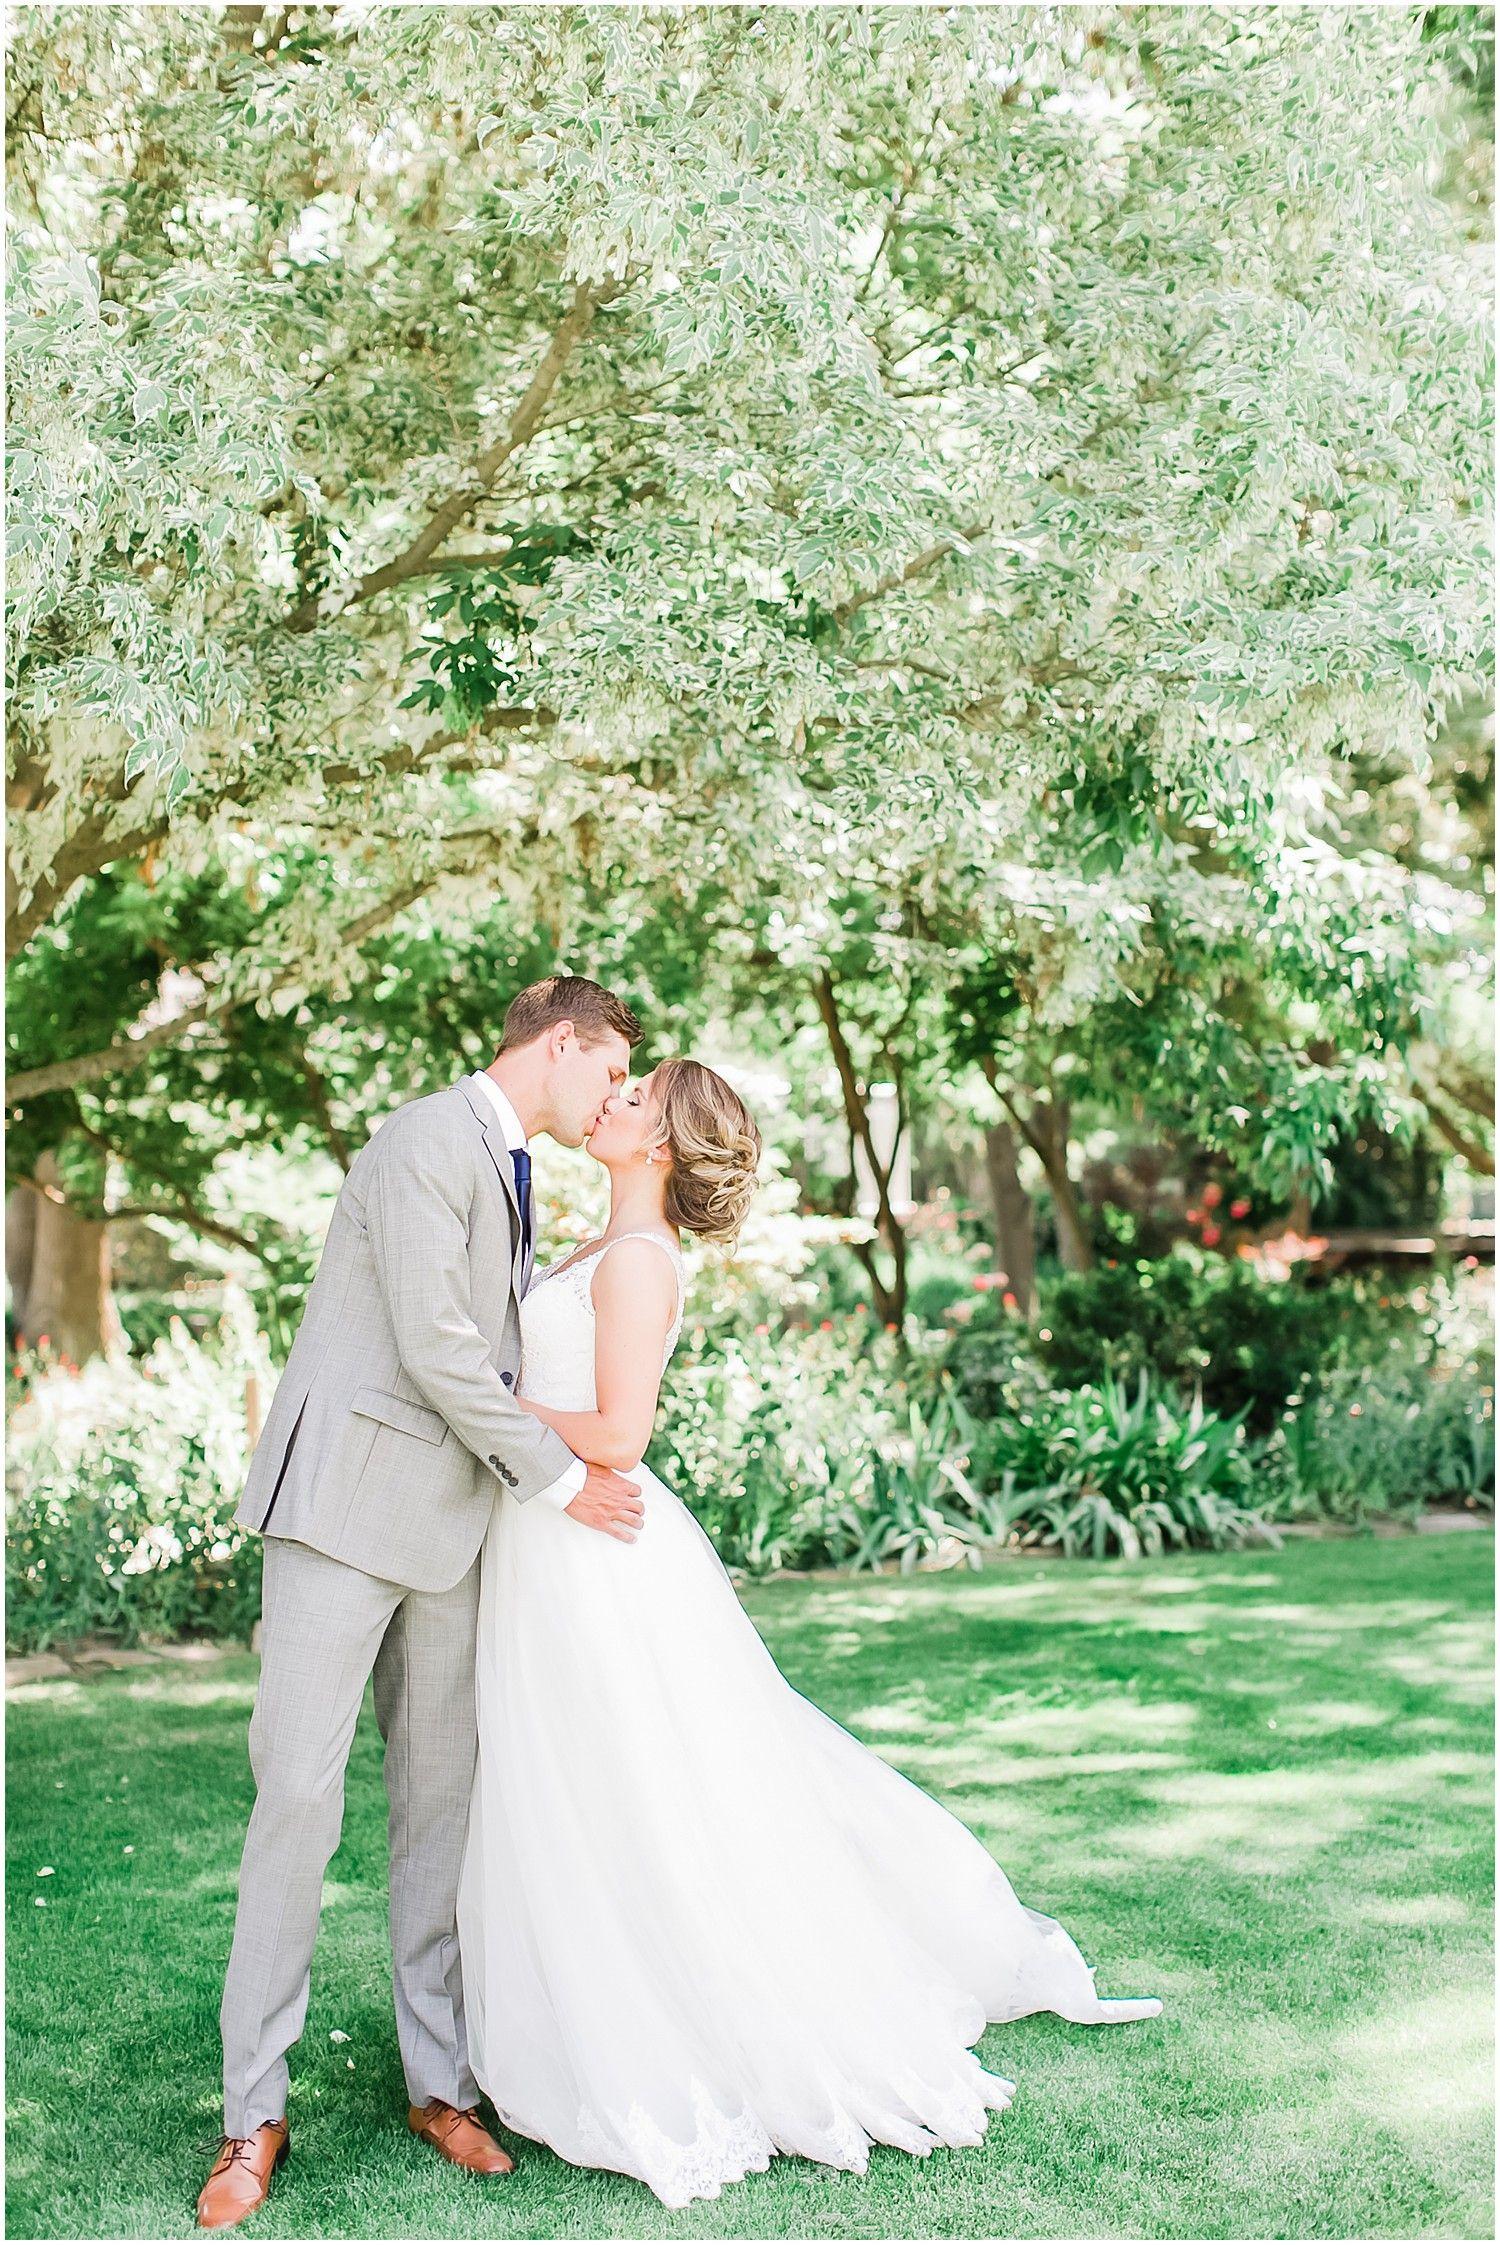 Visalia Rustic Backyard Wedding Backyard Wedding Rustic Backyard California Backyard